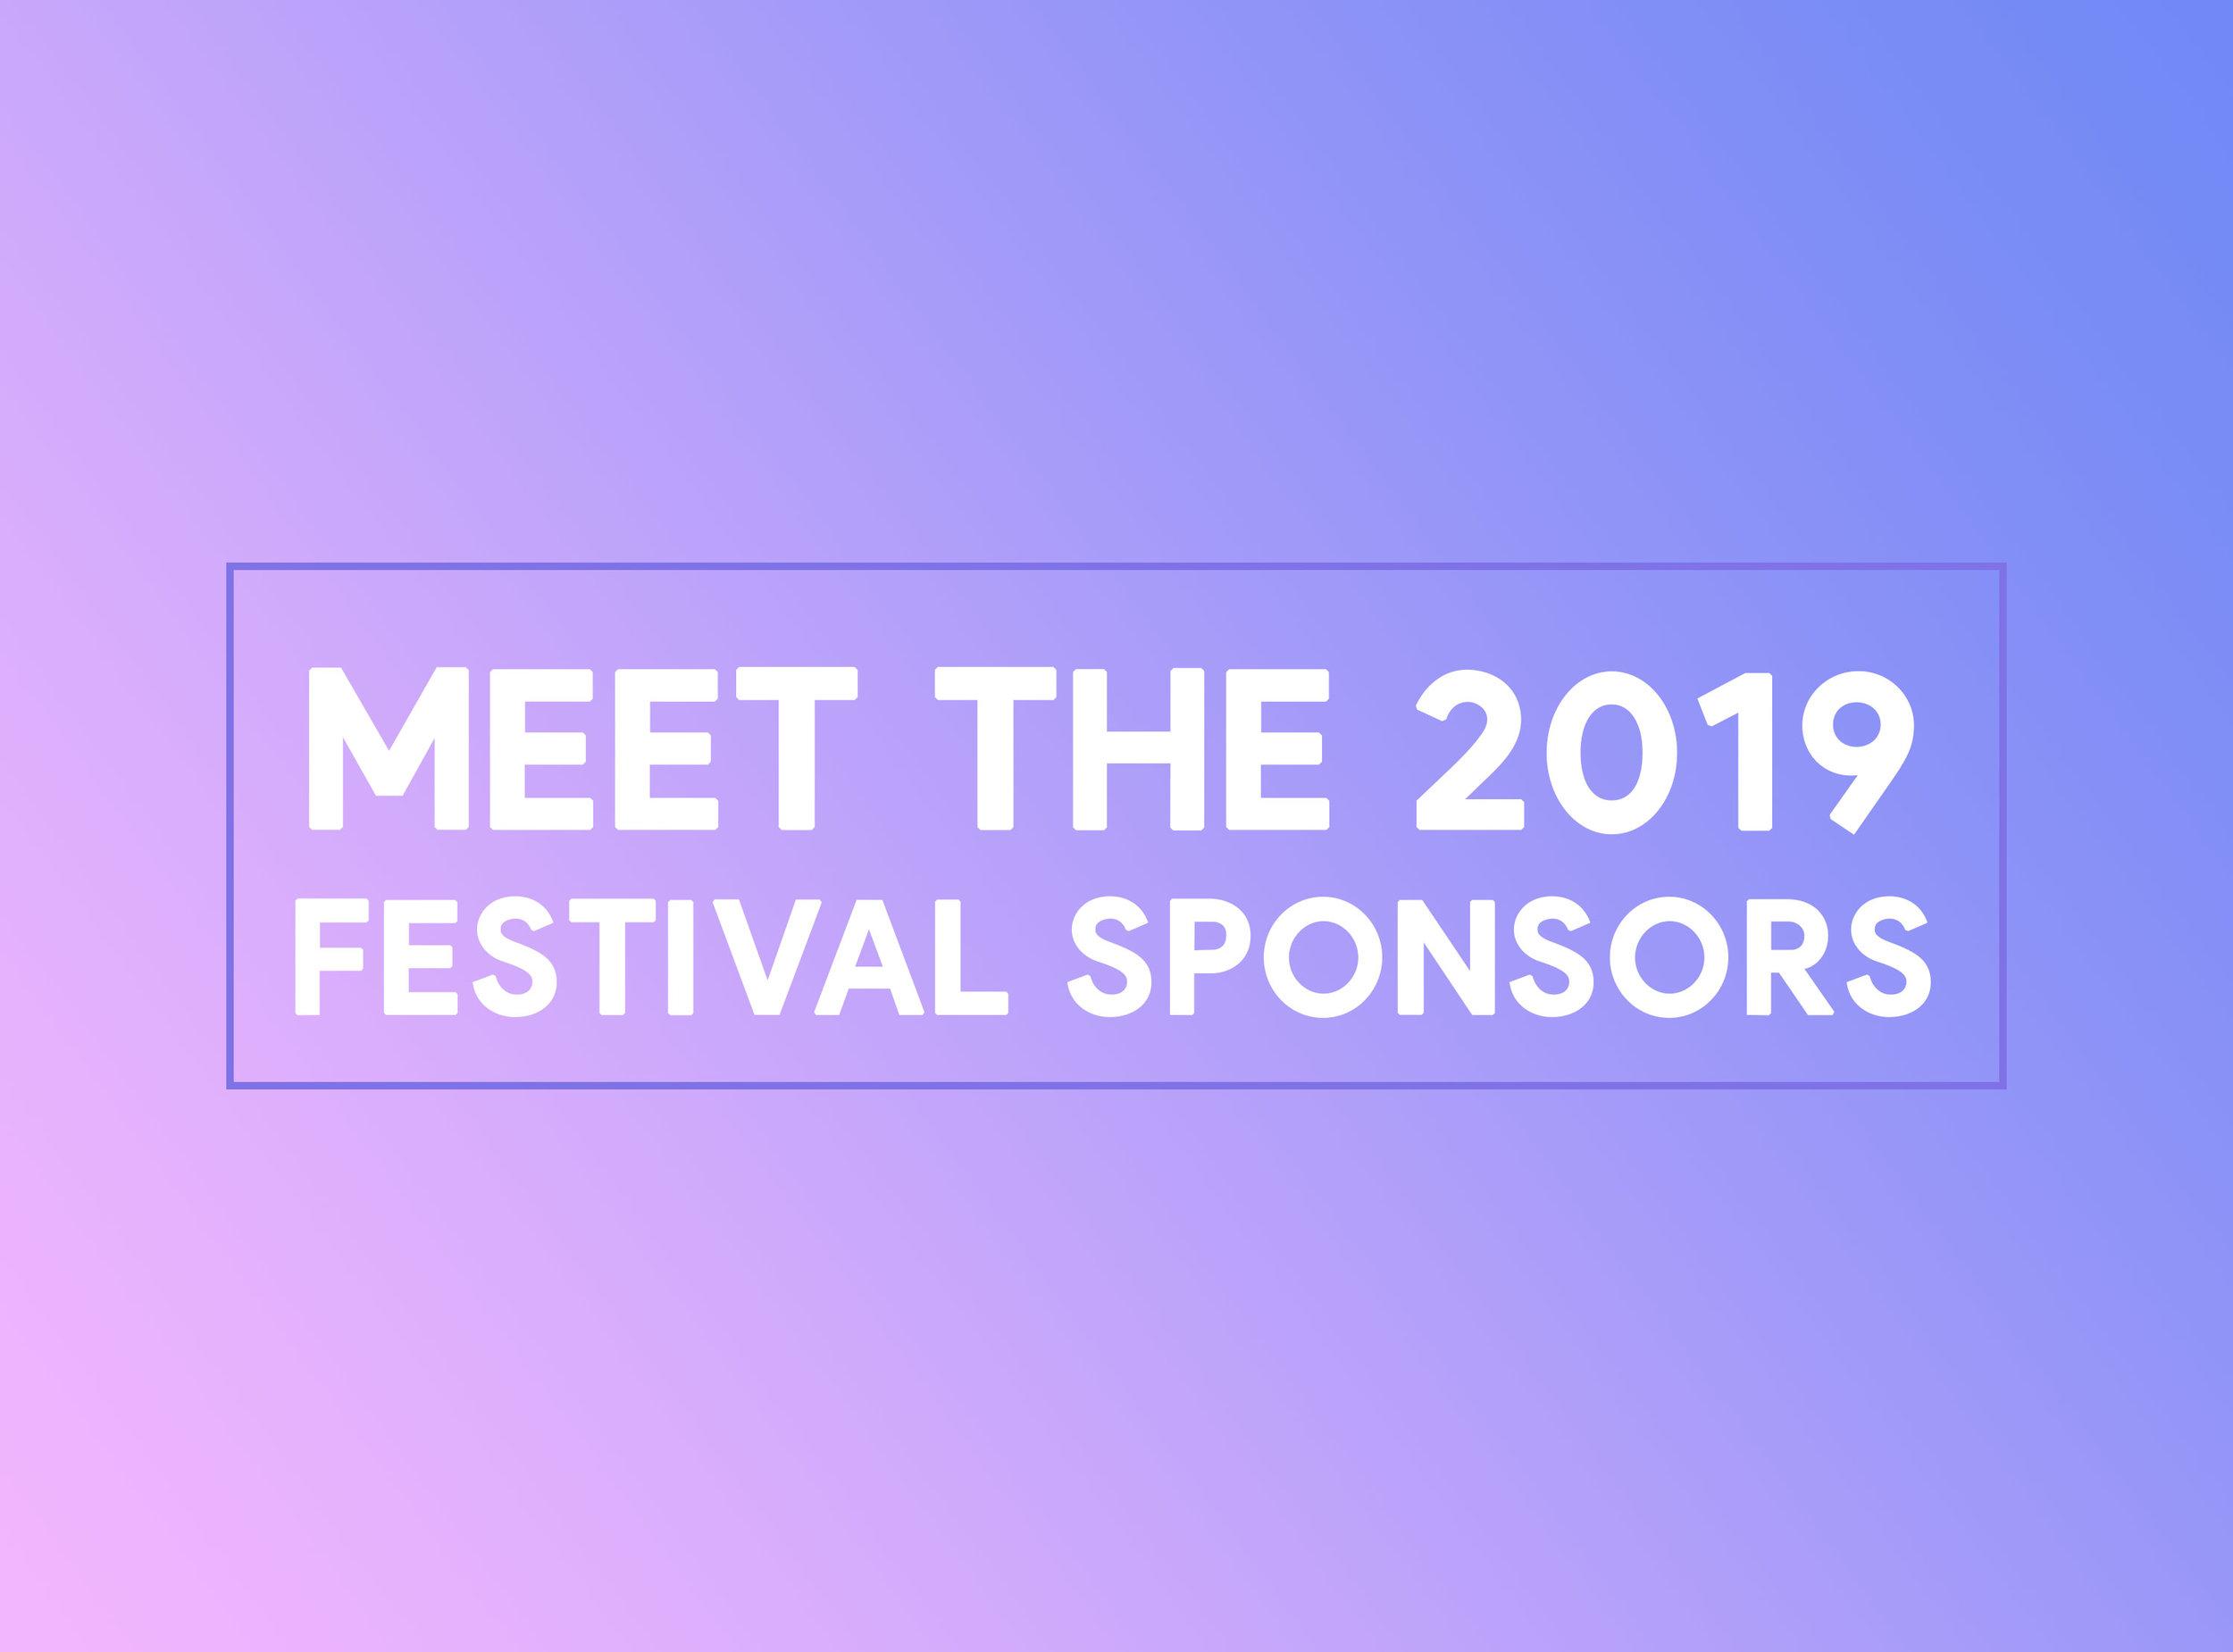 meet-the sponsors.jpg